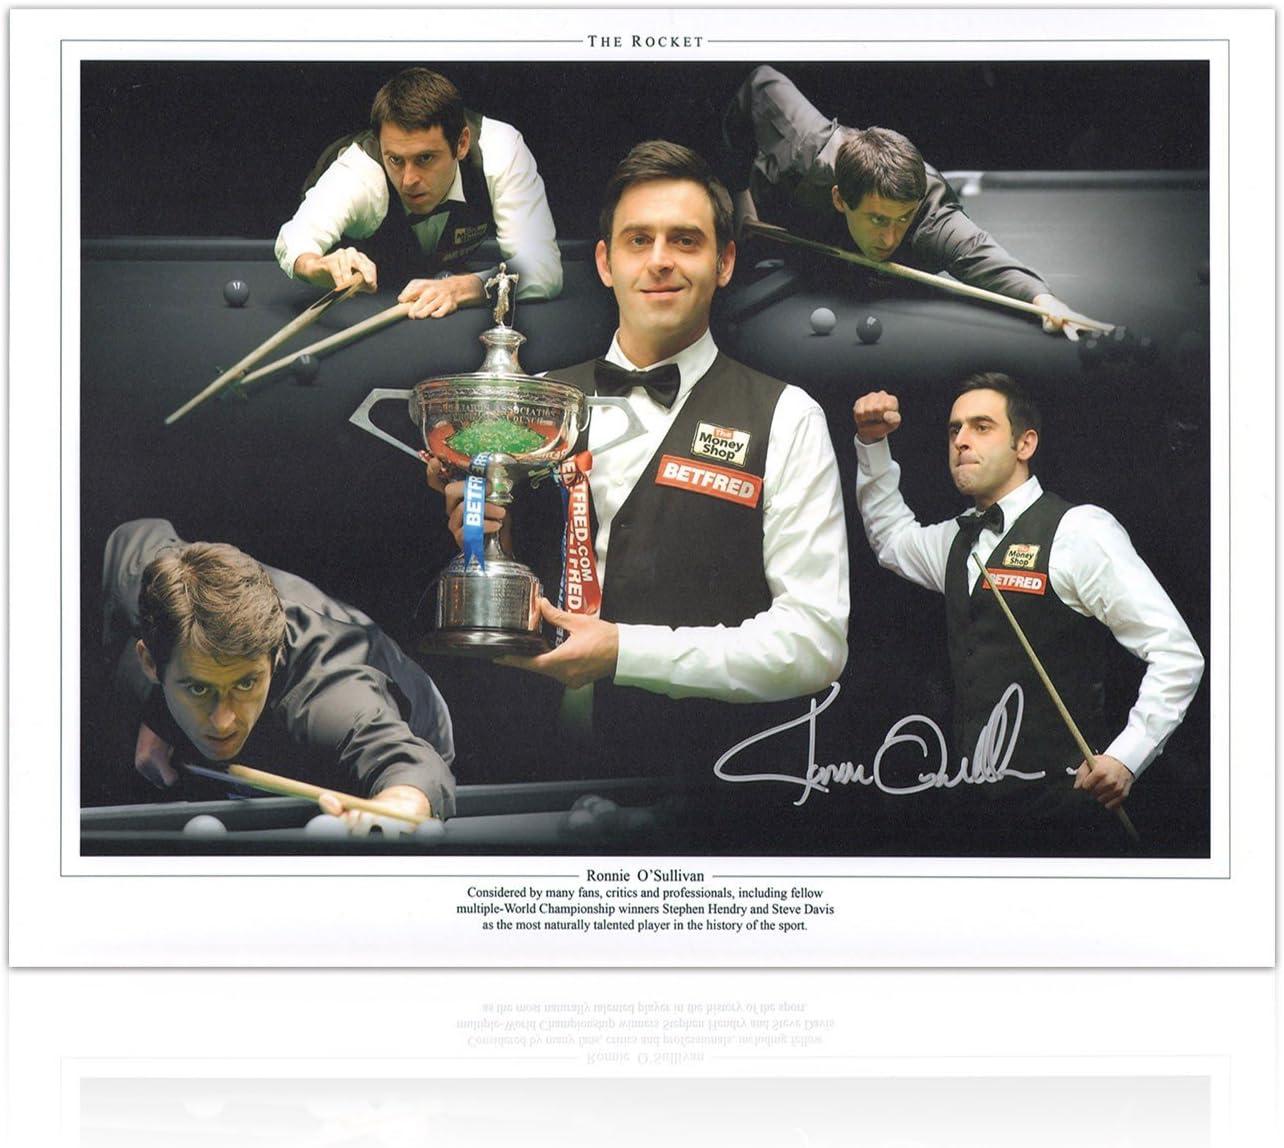 Ronnie OSullivan Snooker Firmado Foto: La mejor alguna vez hubo ...